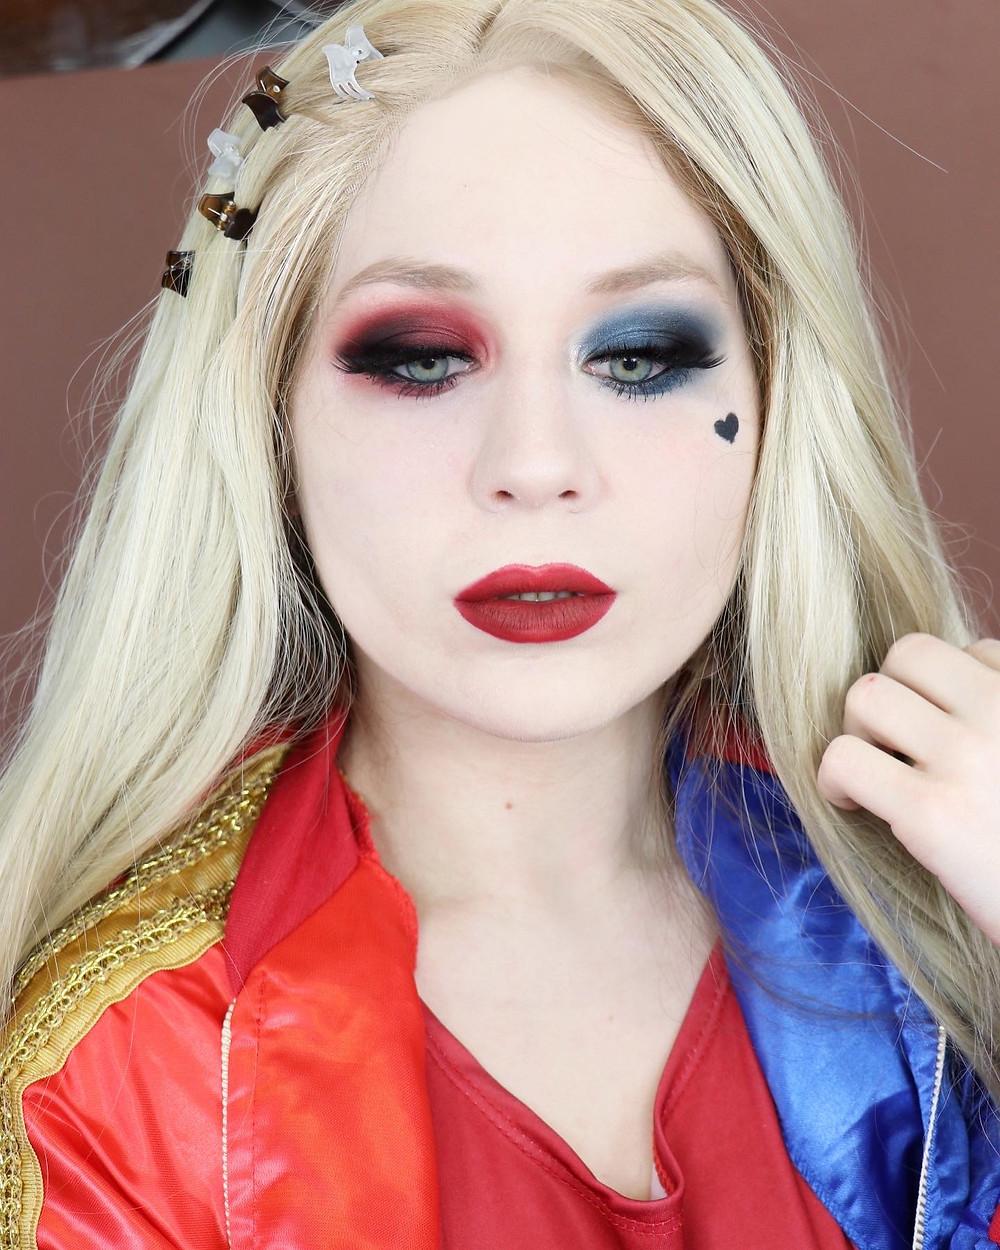 Harley Quinn Dramatic Smokey Eye Makeup Tutorial DC COMICS Cosplay 2020   Lillee Jean